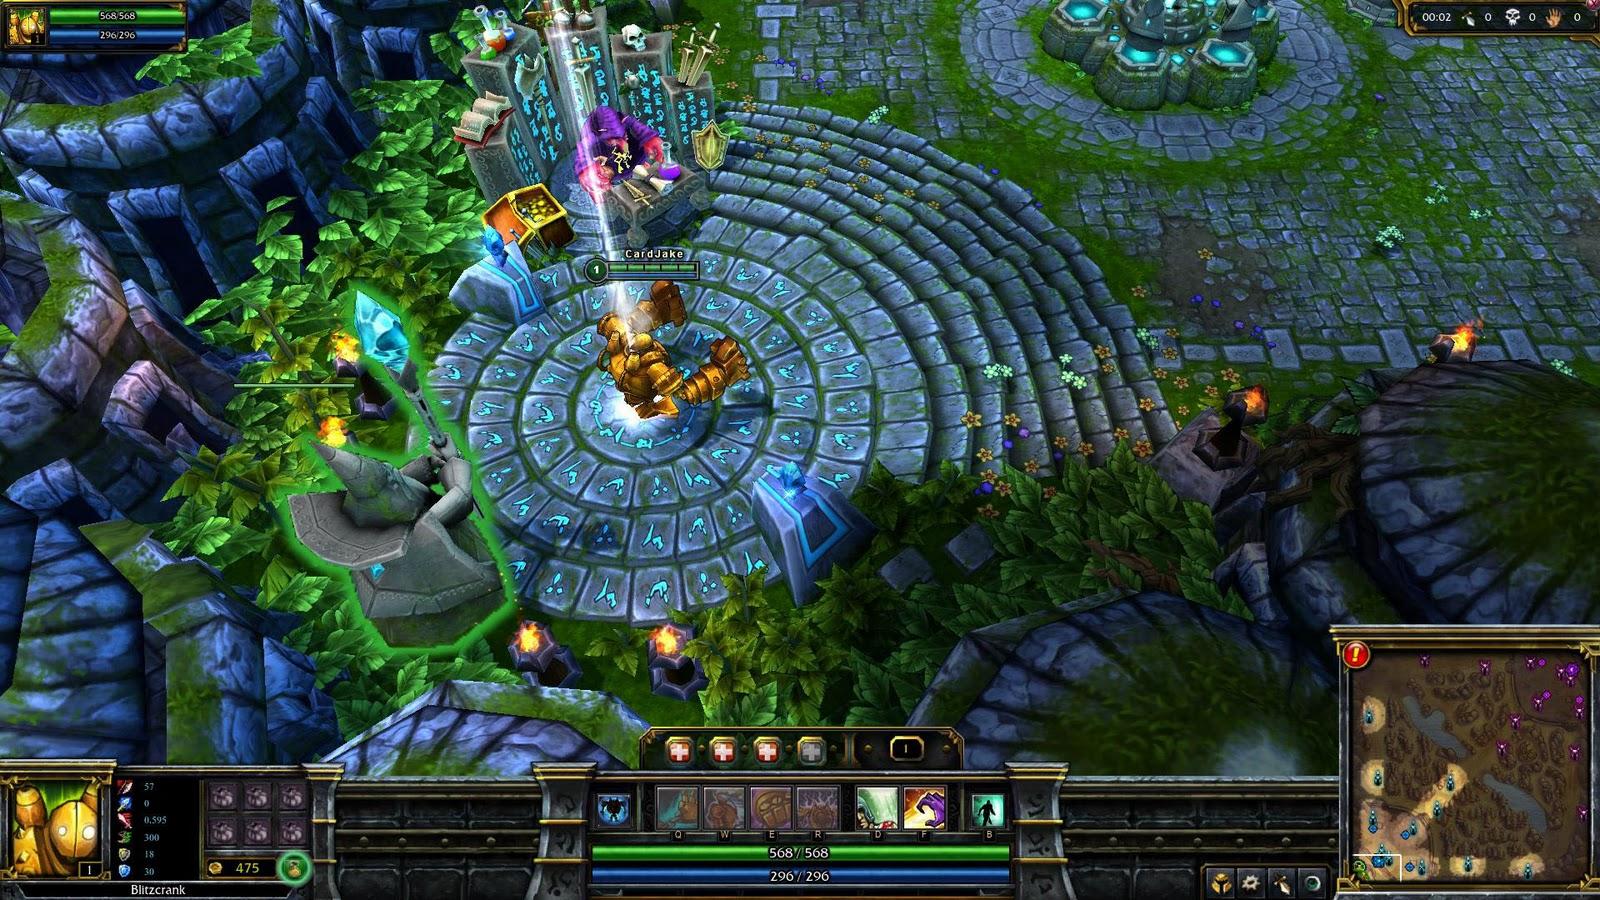 Juegos Multijugador Dark Orbit League Of Legends